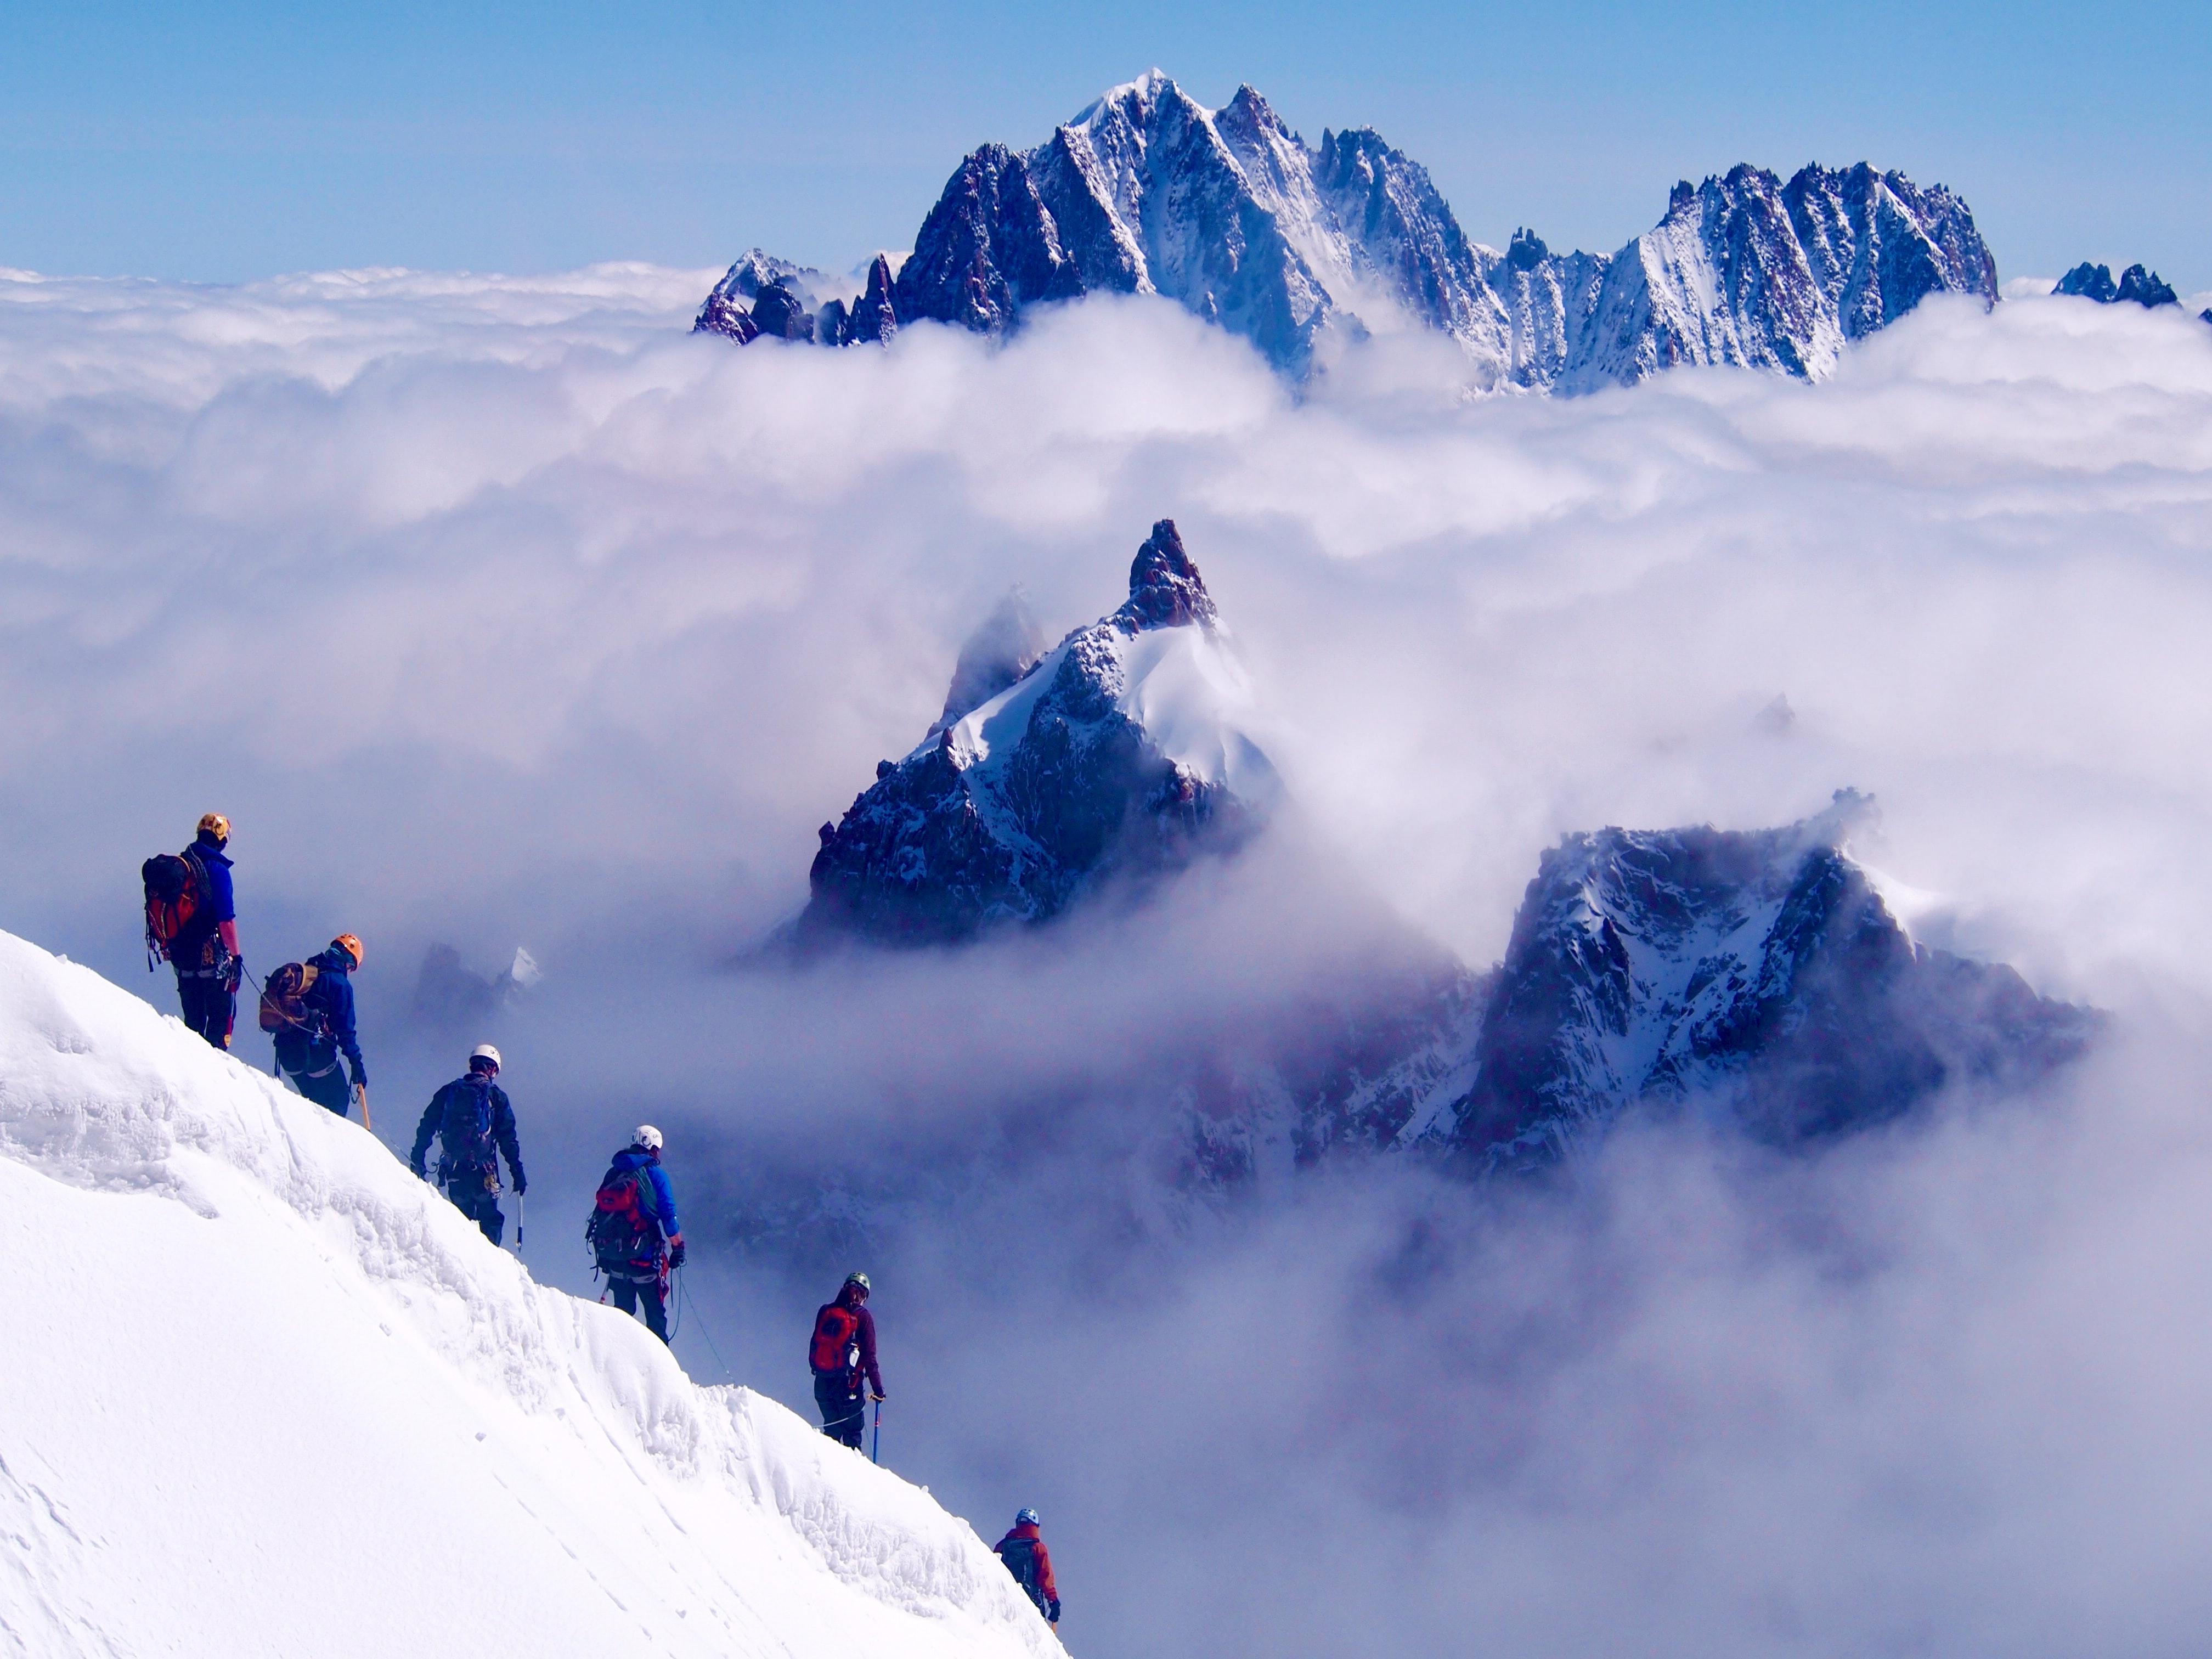 europe, hiking, travel, tips, localbini, biniblog, adventure, experience, local, authentic, mountains, scenery, mont blanc, switzerland, snow, mountain, peak